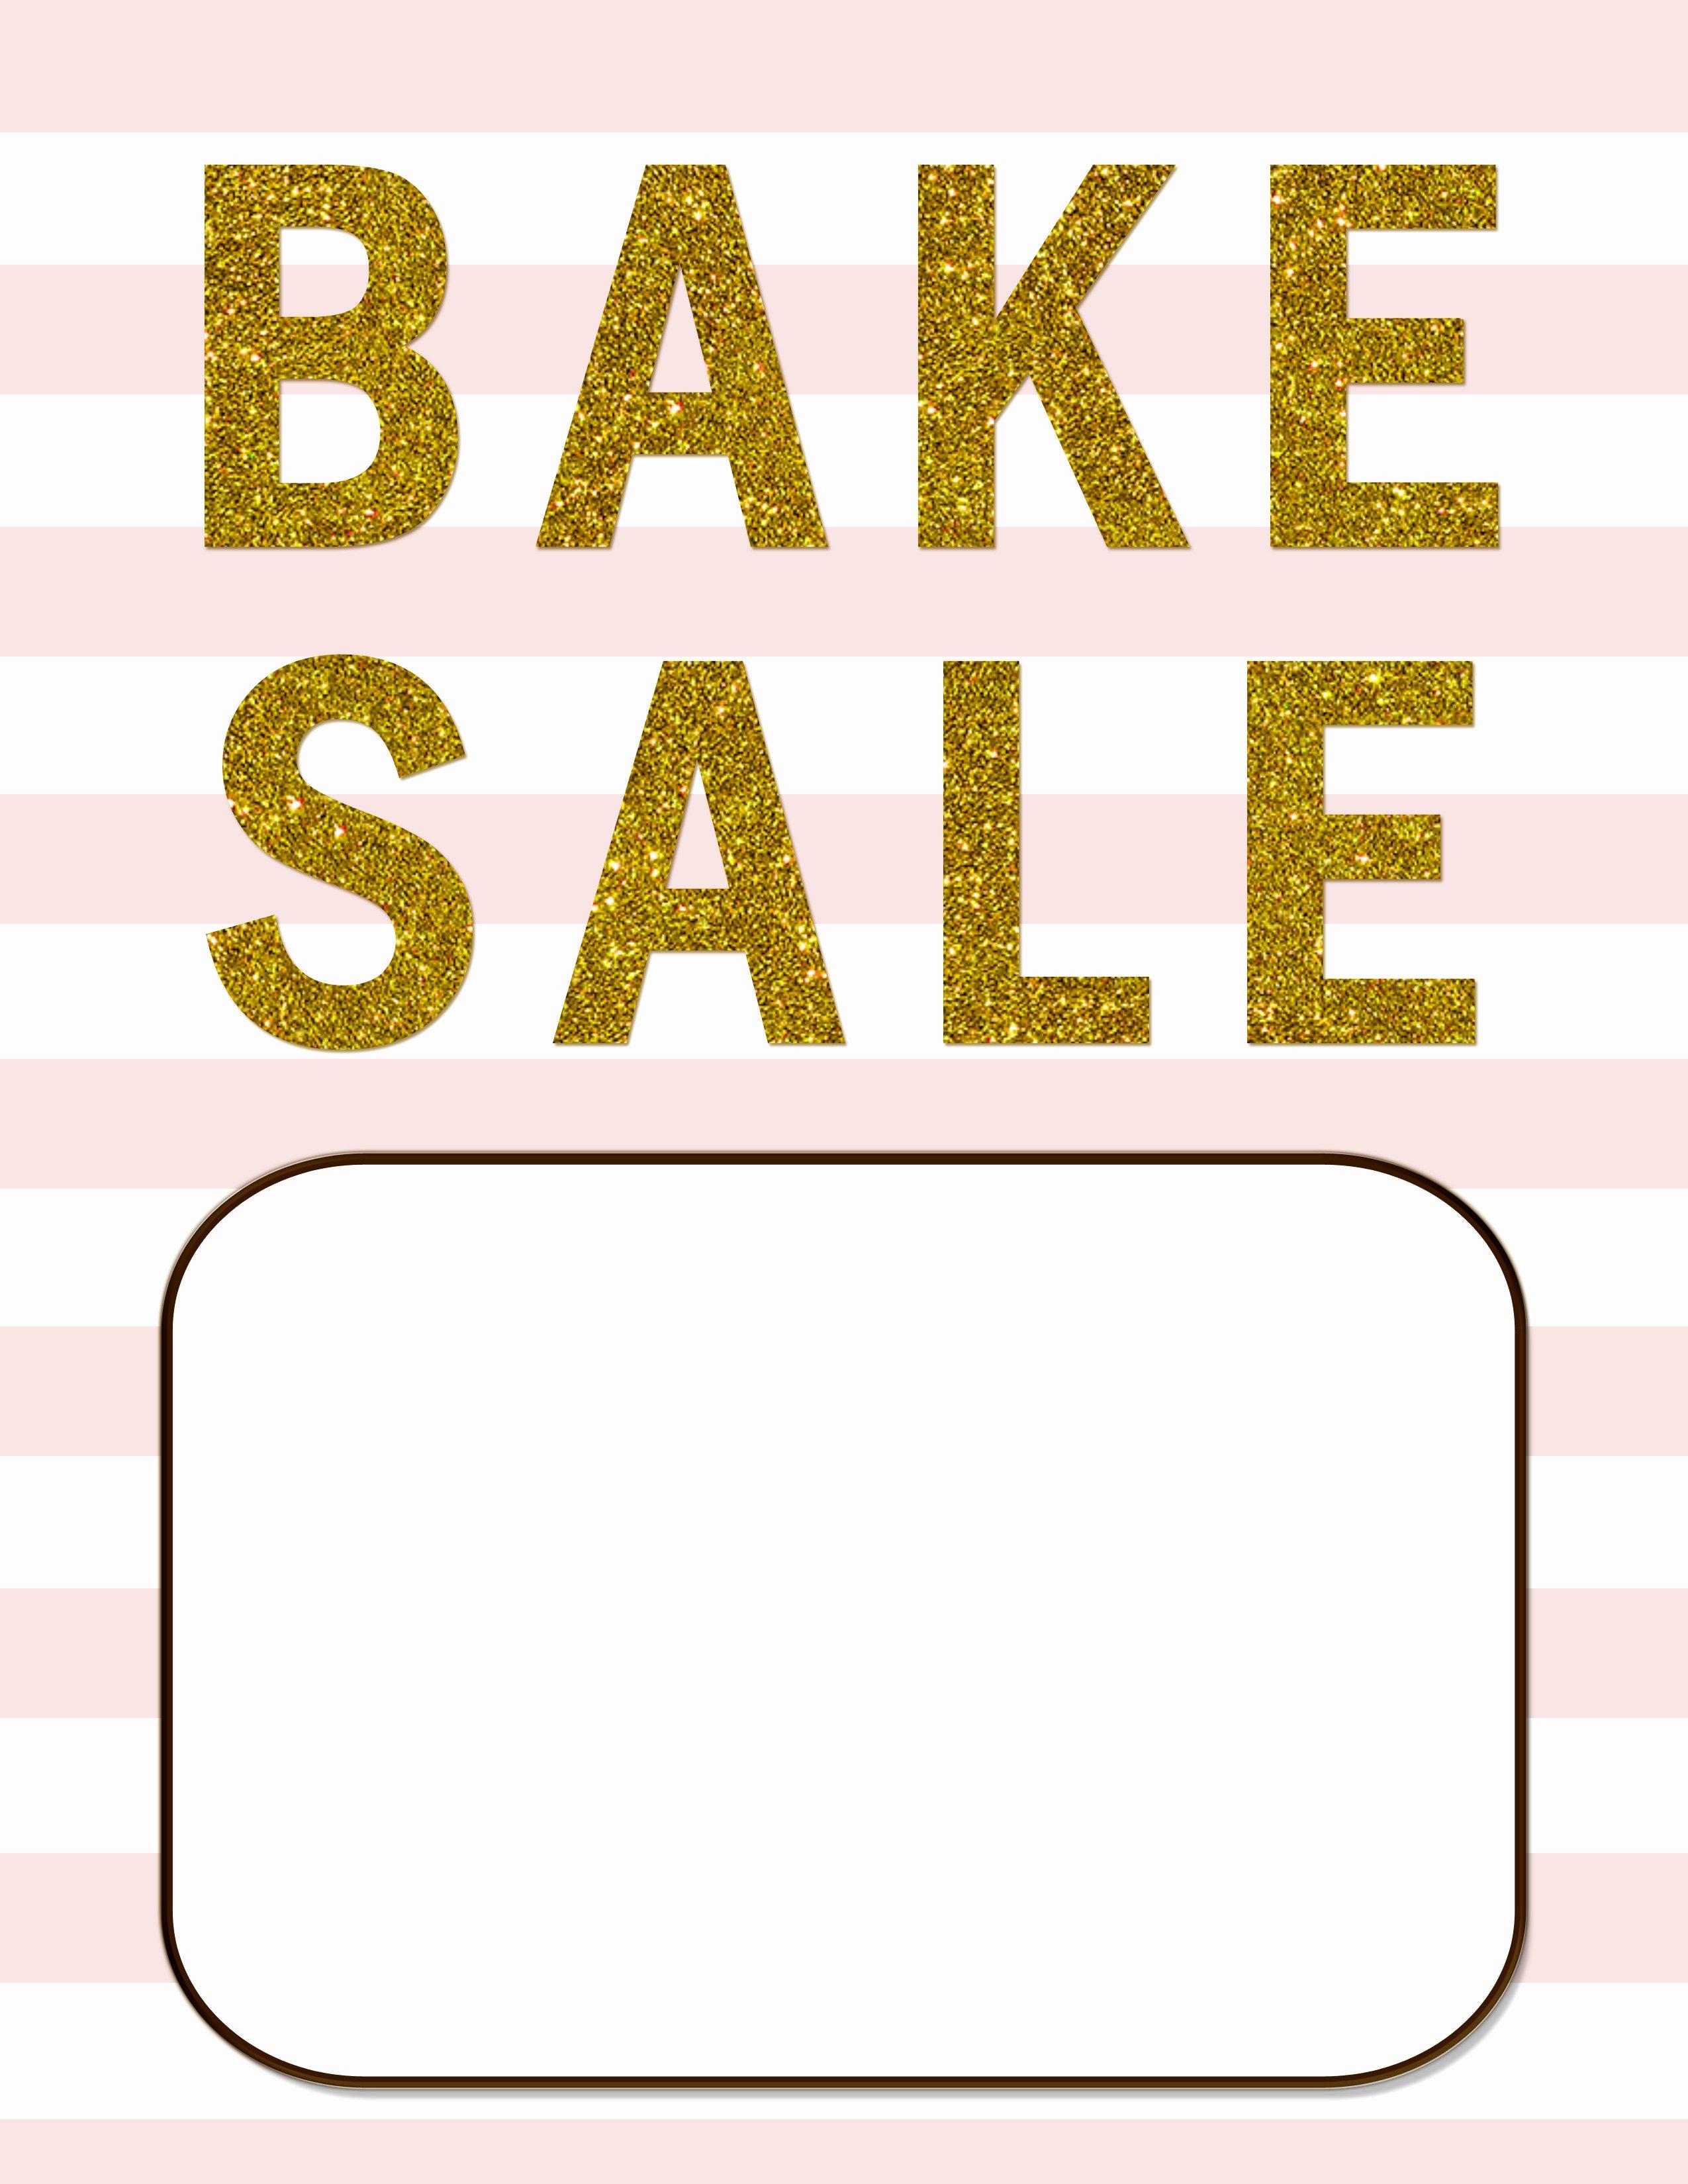 Bake Sale Flyer Template Inspirational Bake Sale Flyers – Free Flyer Designs